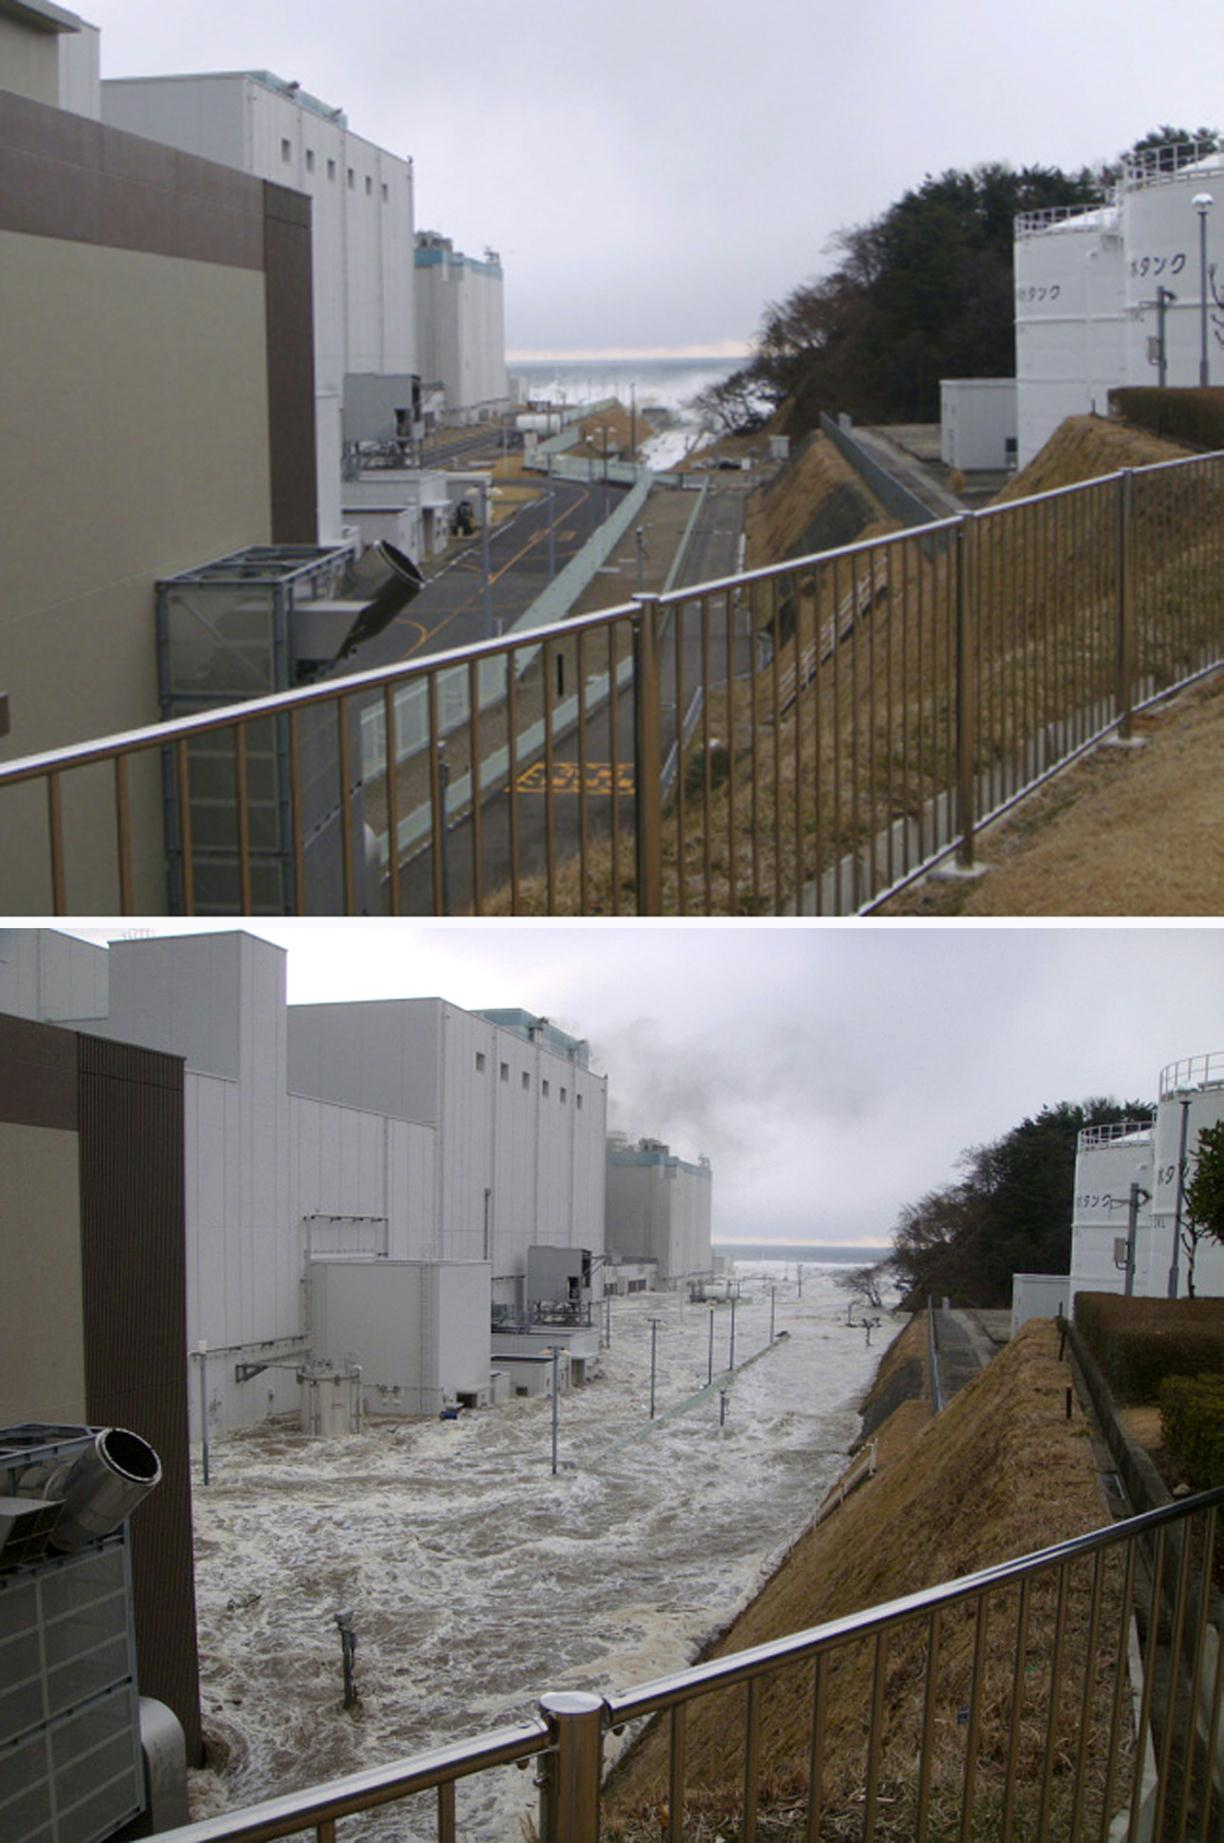 water rushing into the Fukushima nuclear reactor during the March 11 tsunami b.jpg